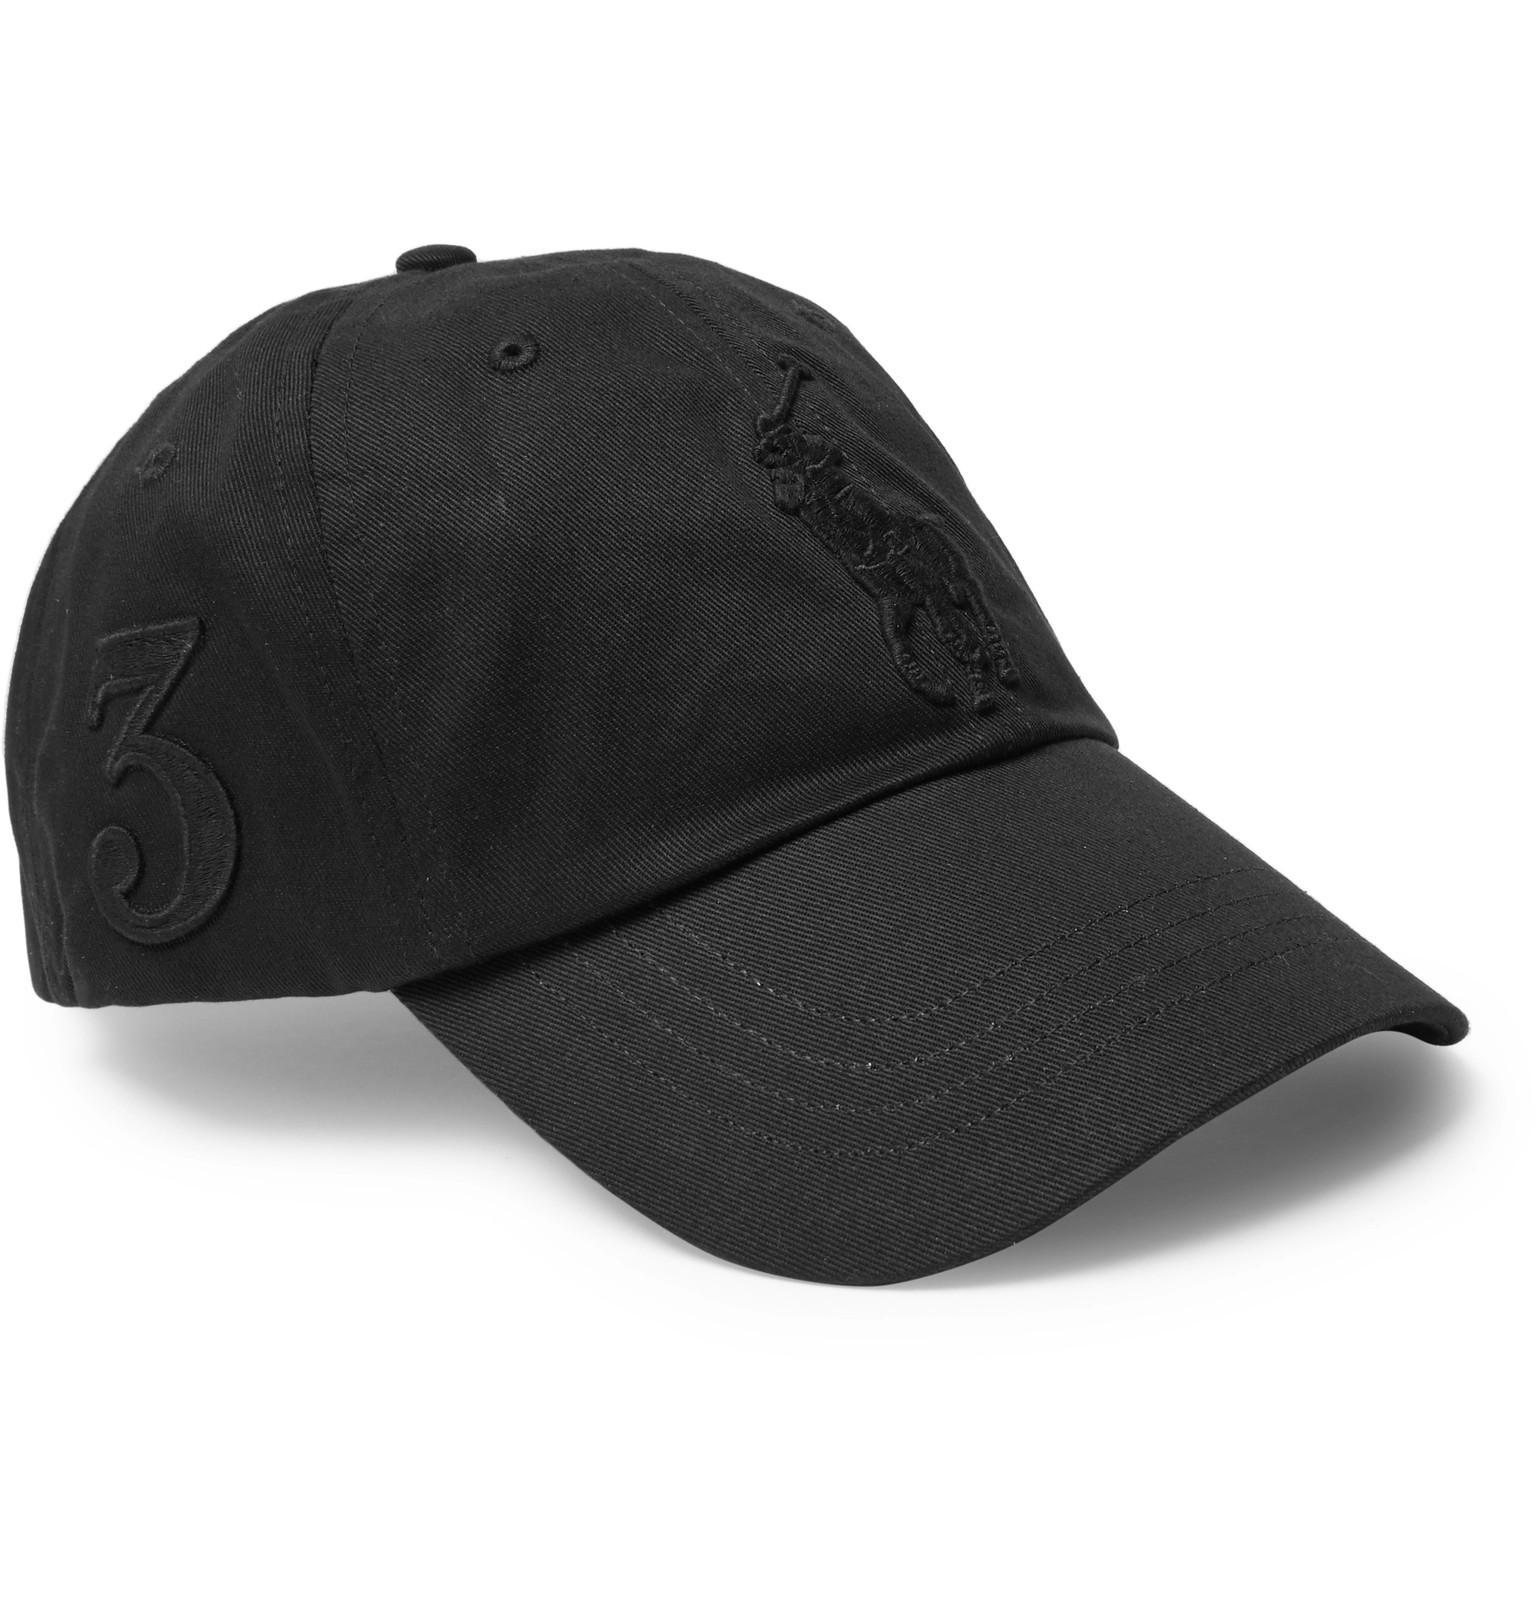 Polo Ralph Lauren Cotton-twill Baseball Cap in Black for Men - Lyst 3f1f86a29e2